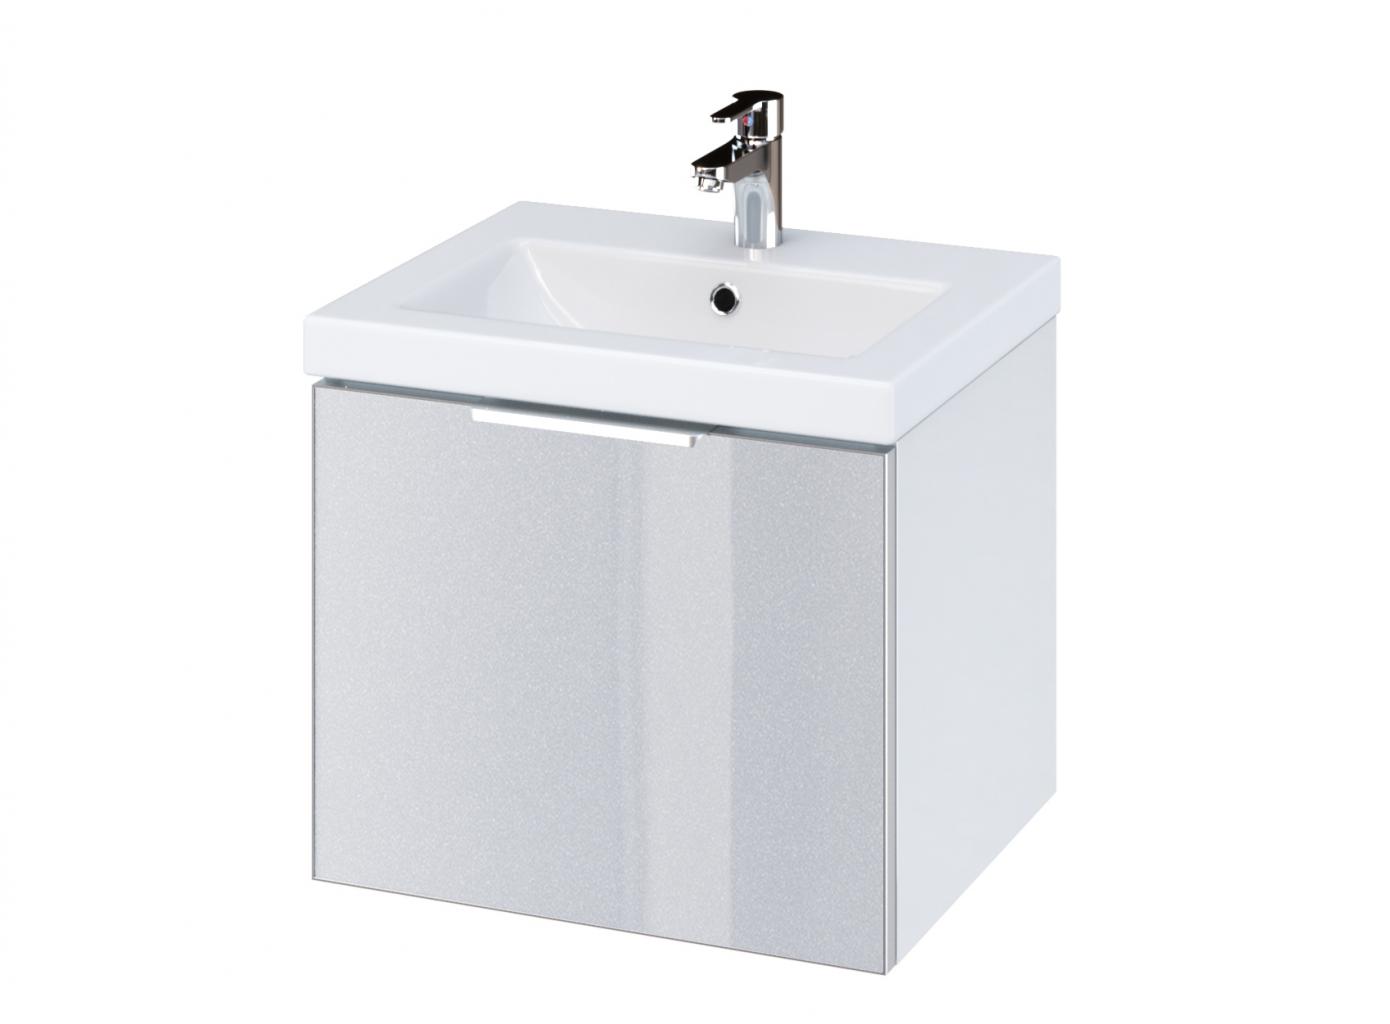 CERSANIT Skříňka STILLO pod umyvadlo COMO/ COLOUR 50, bílá/ šedá dvířka (S575-002)